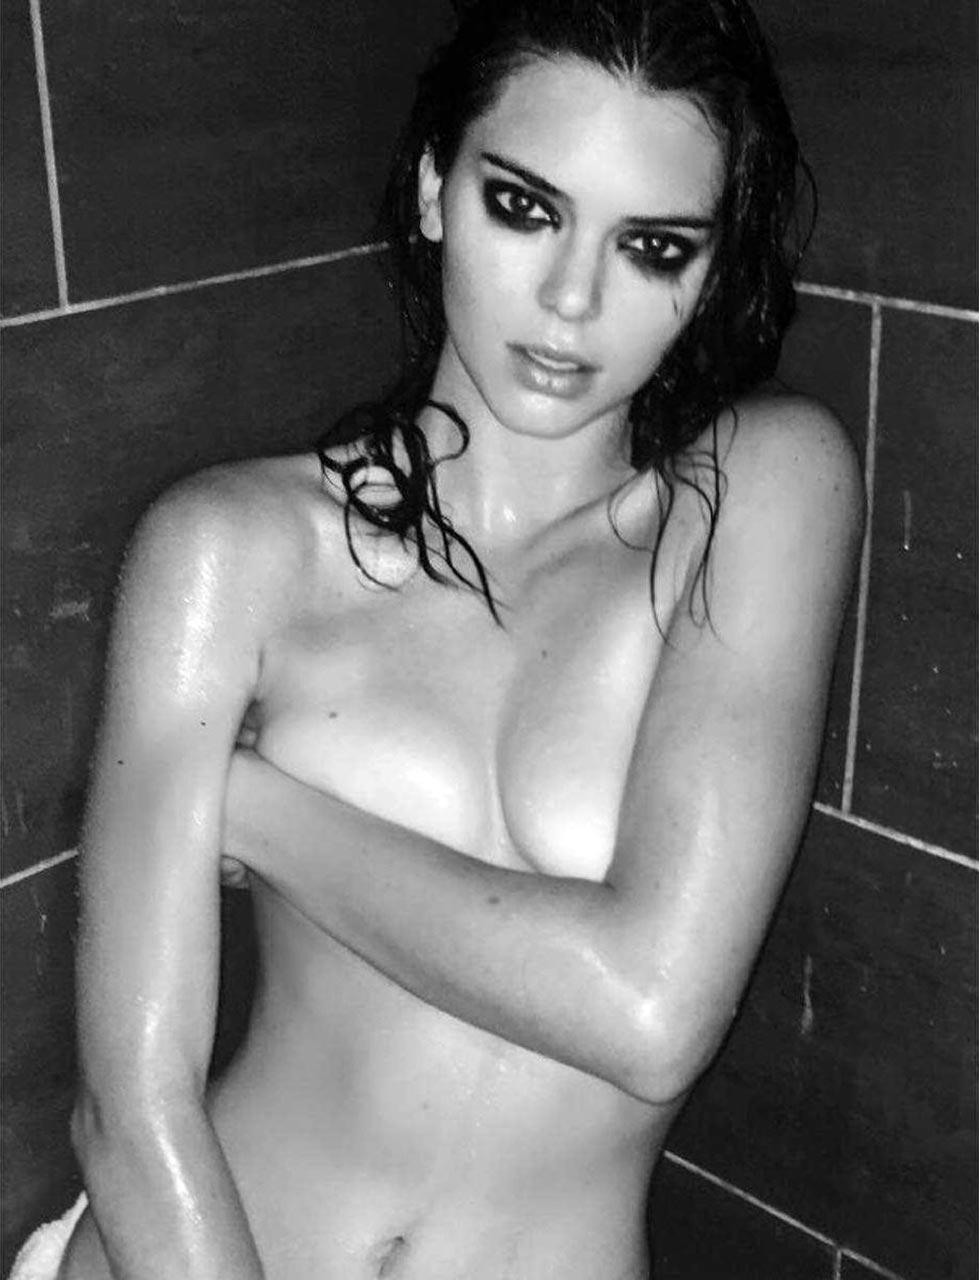 Kendall Jenner Topless Photos